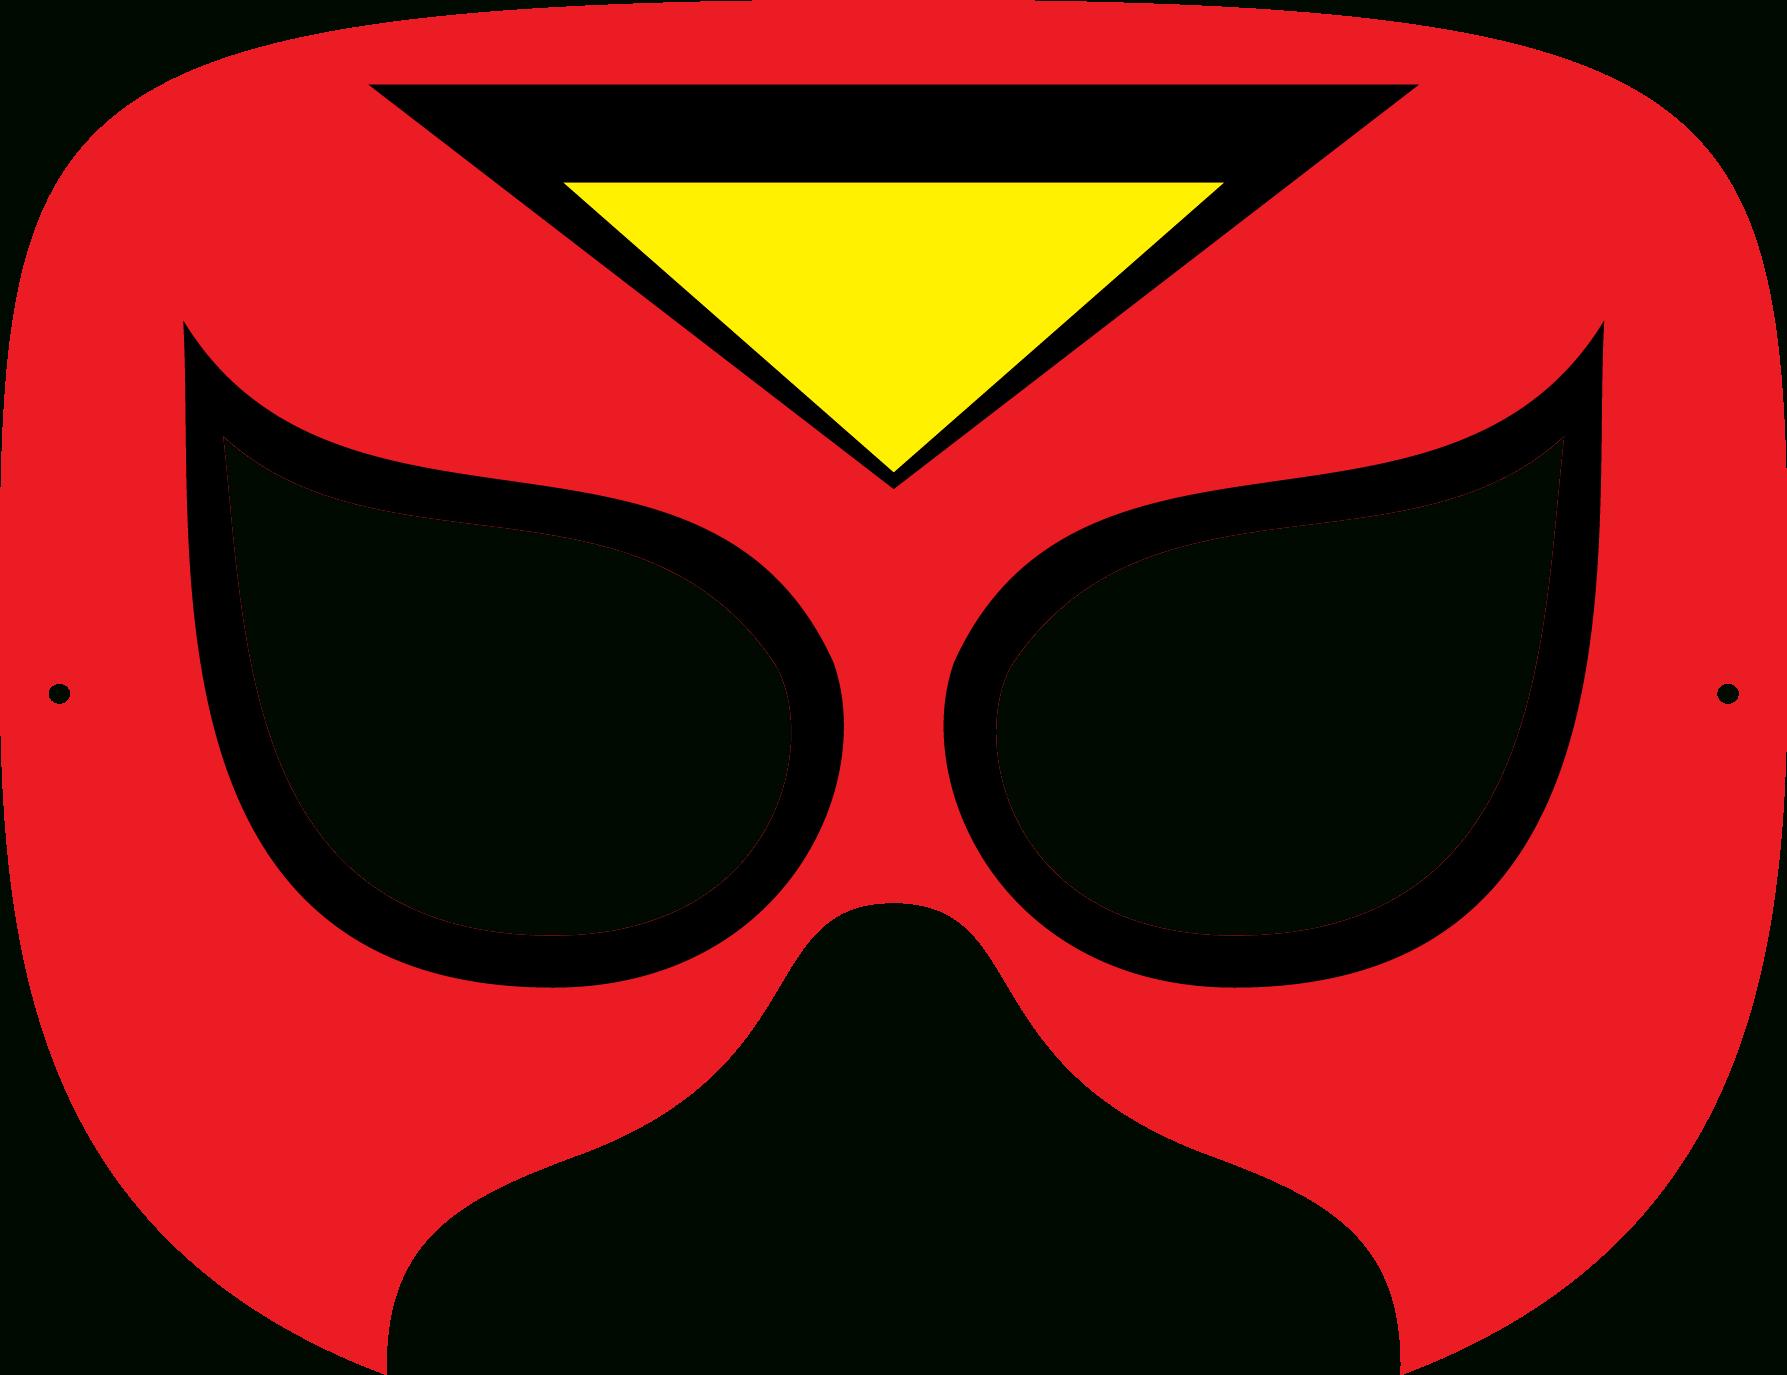 Superhero Mask Template | Free Download Best Superhero Mask Template - Free Printable Superhero Masks